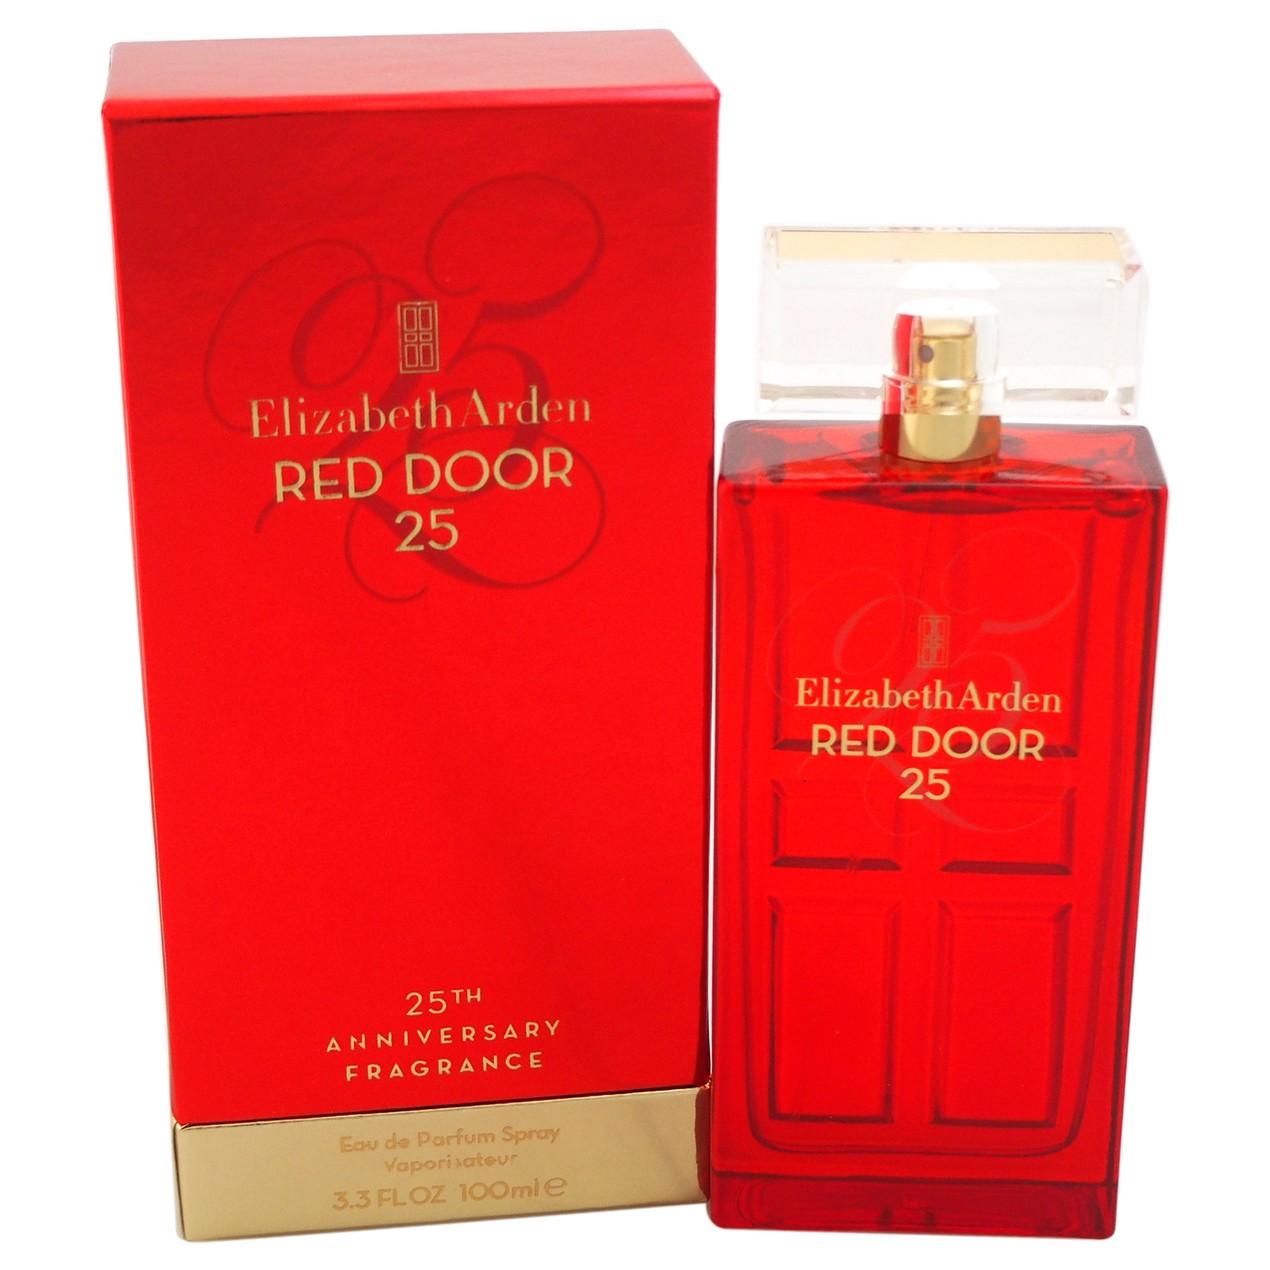 Red Door 25 Elizabeth Arden 33oz Edp Spray 25th Anniversary